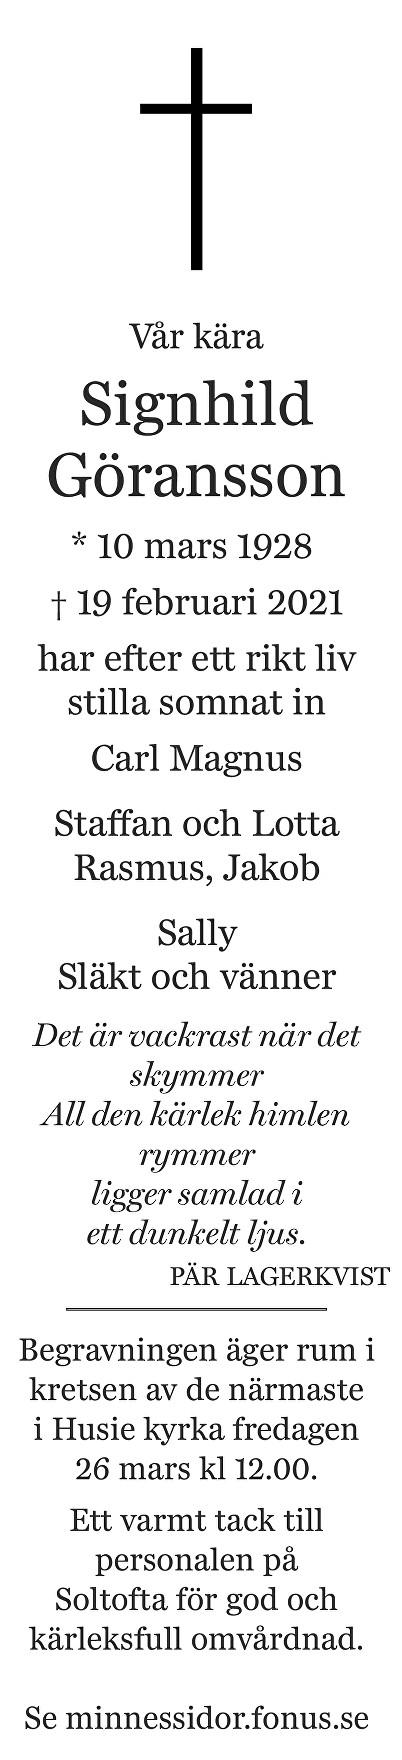 Signhild Göransson Death notice